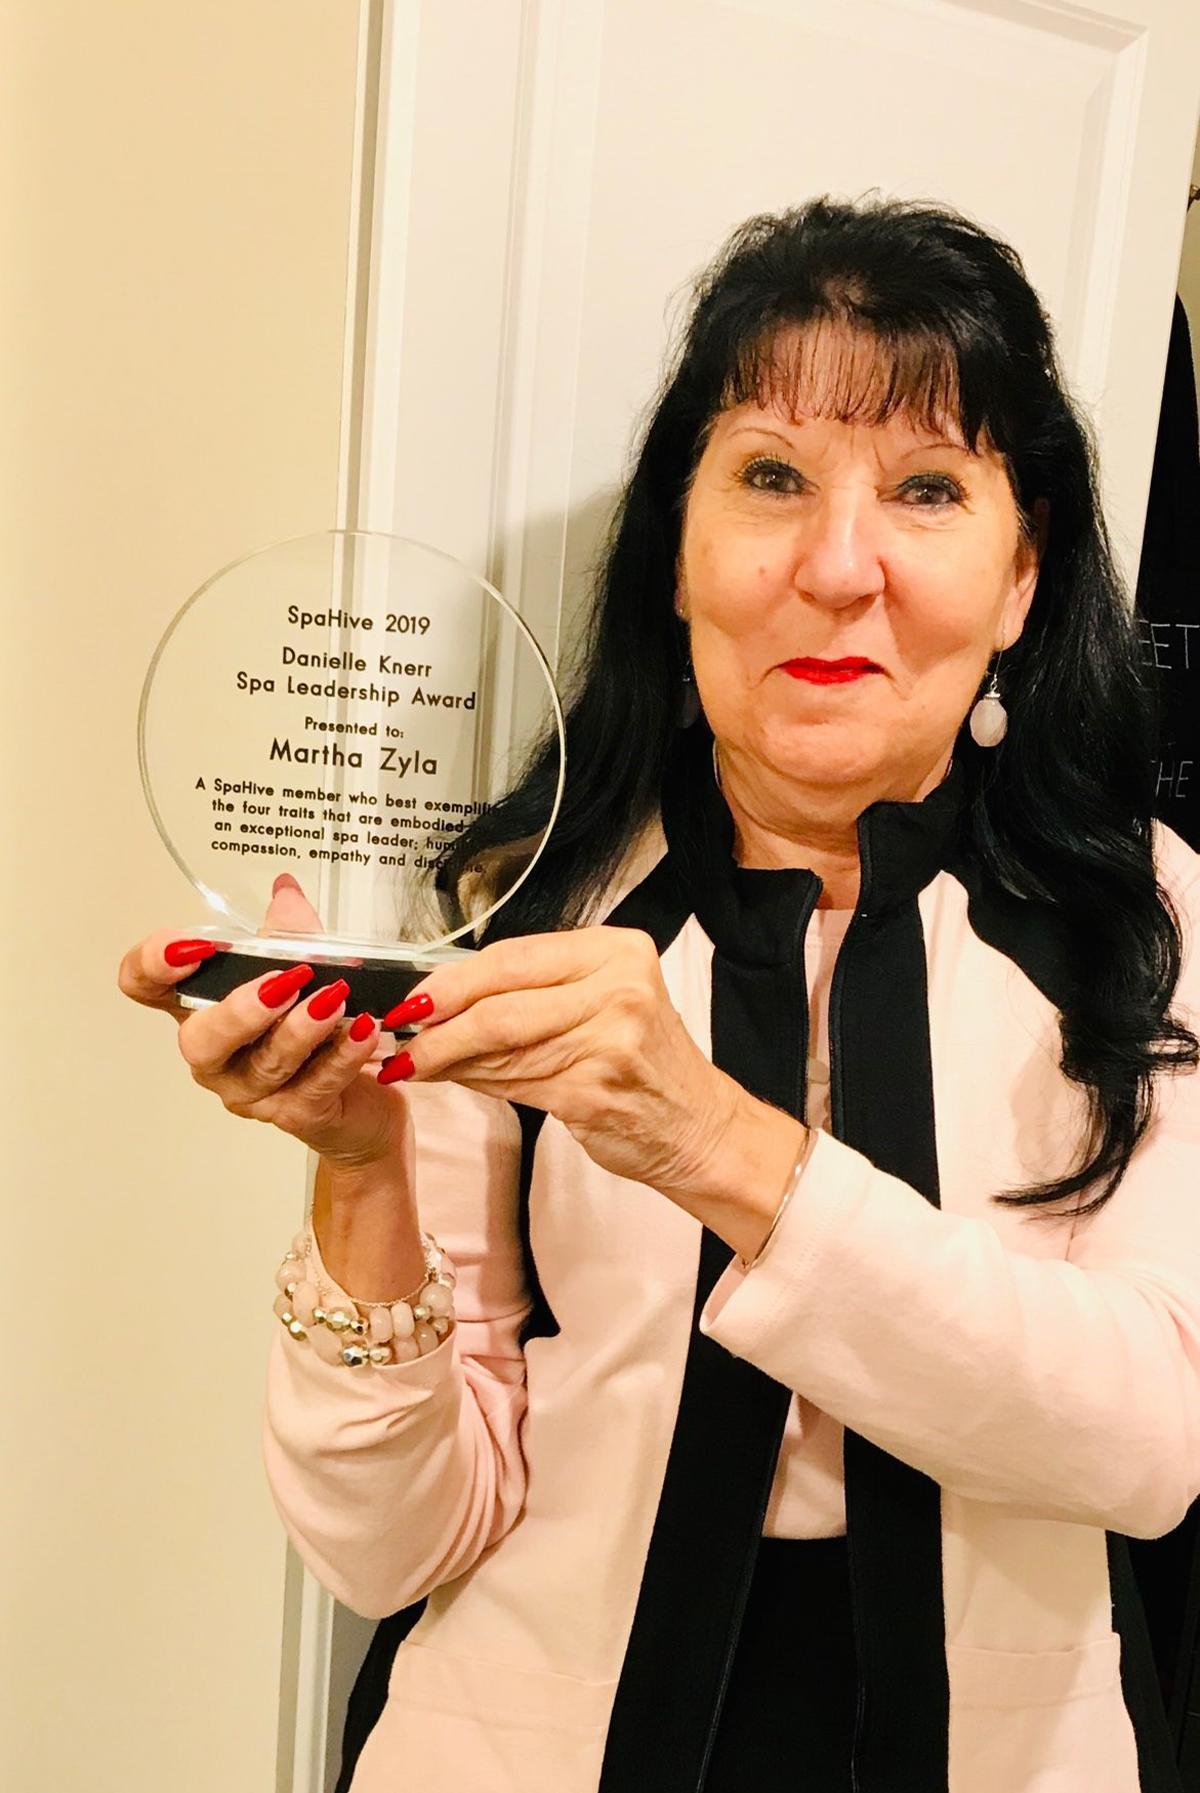 The 2019 award was given to Martha Zyla, spa director at Cascade Spa at Mill Falls, New Hampshire.